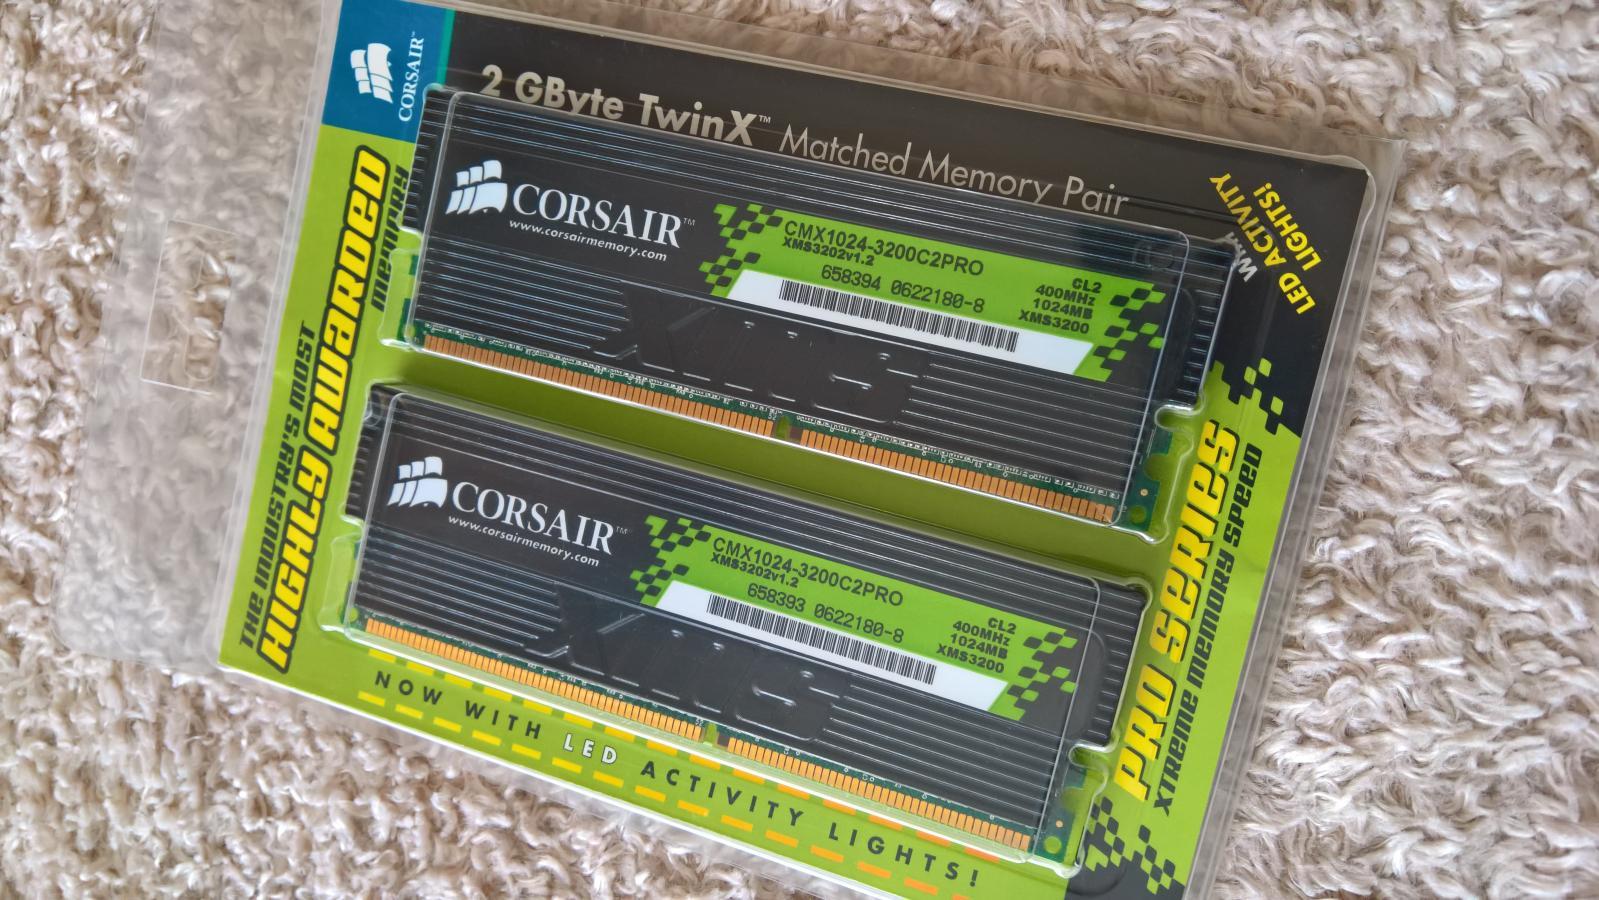 Photo of Corsair Pro Xtreme 2GB CMX1024-3200C2PRO 400MHz XMS3202V1.2